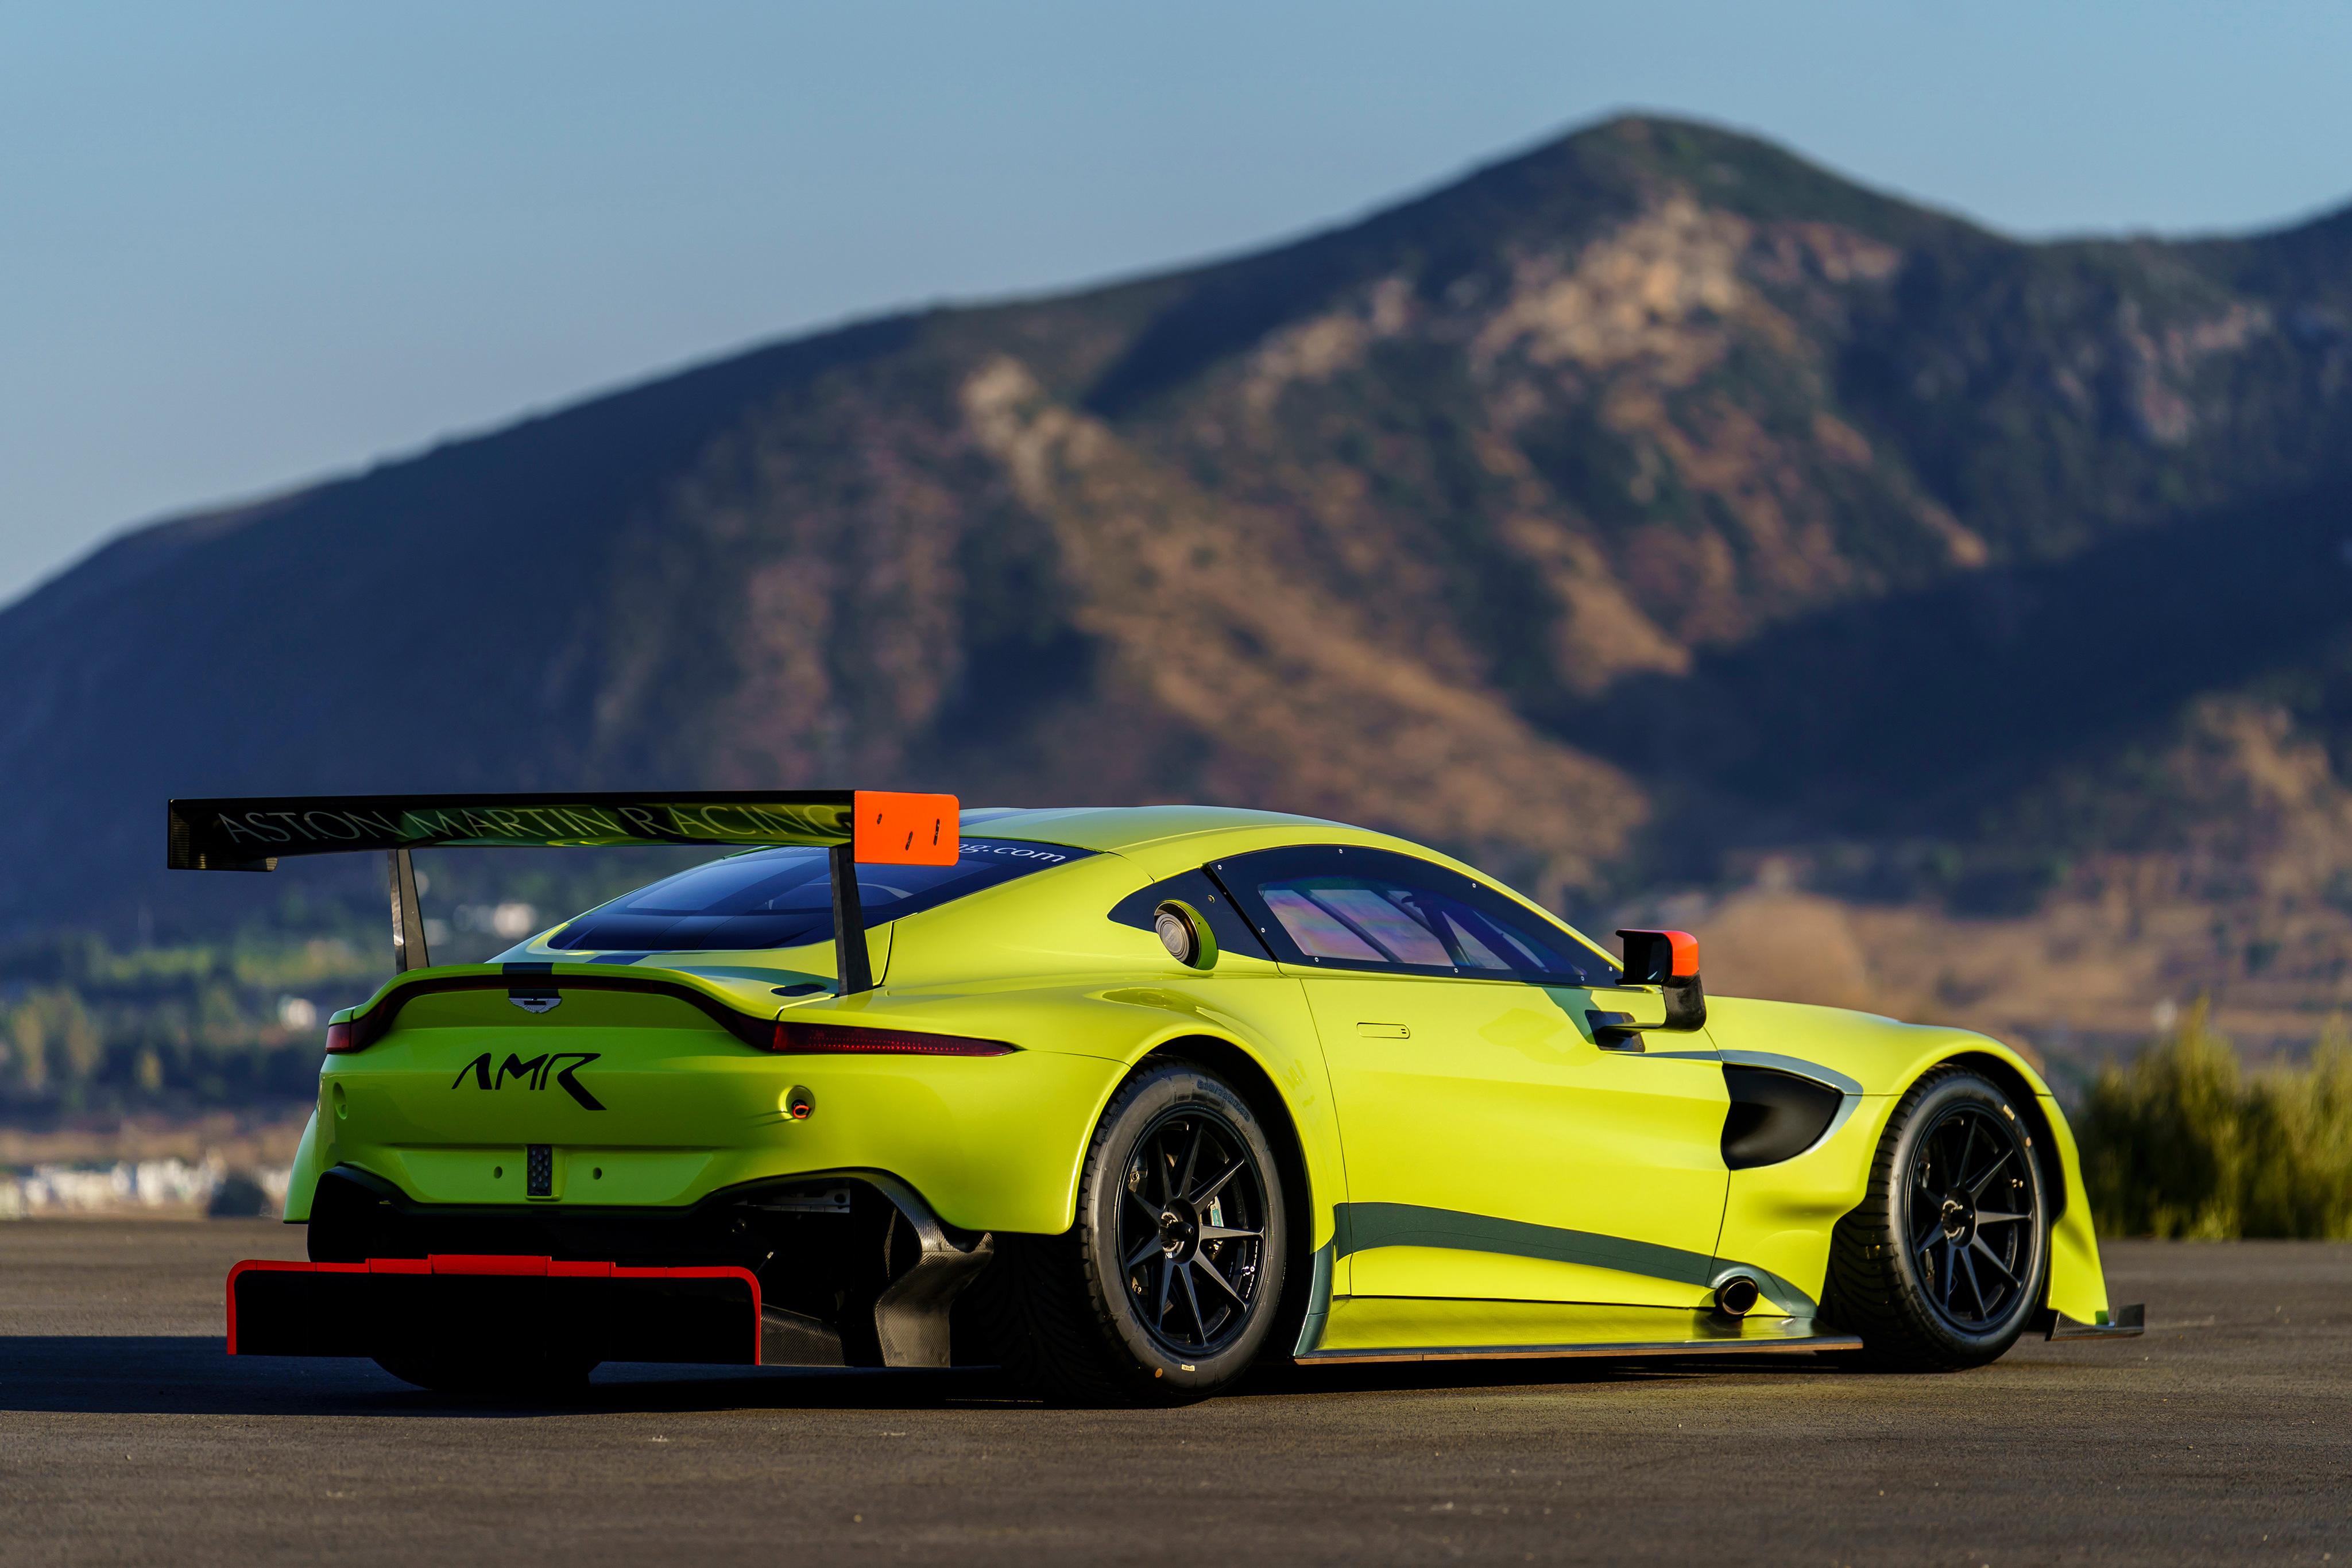 2560x1600 Aston Martin Vantage Back 4k 2560x1600 Resolution